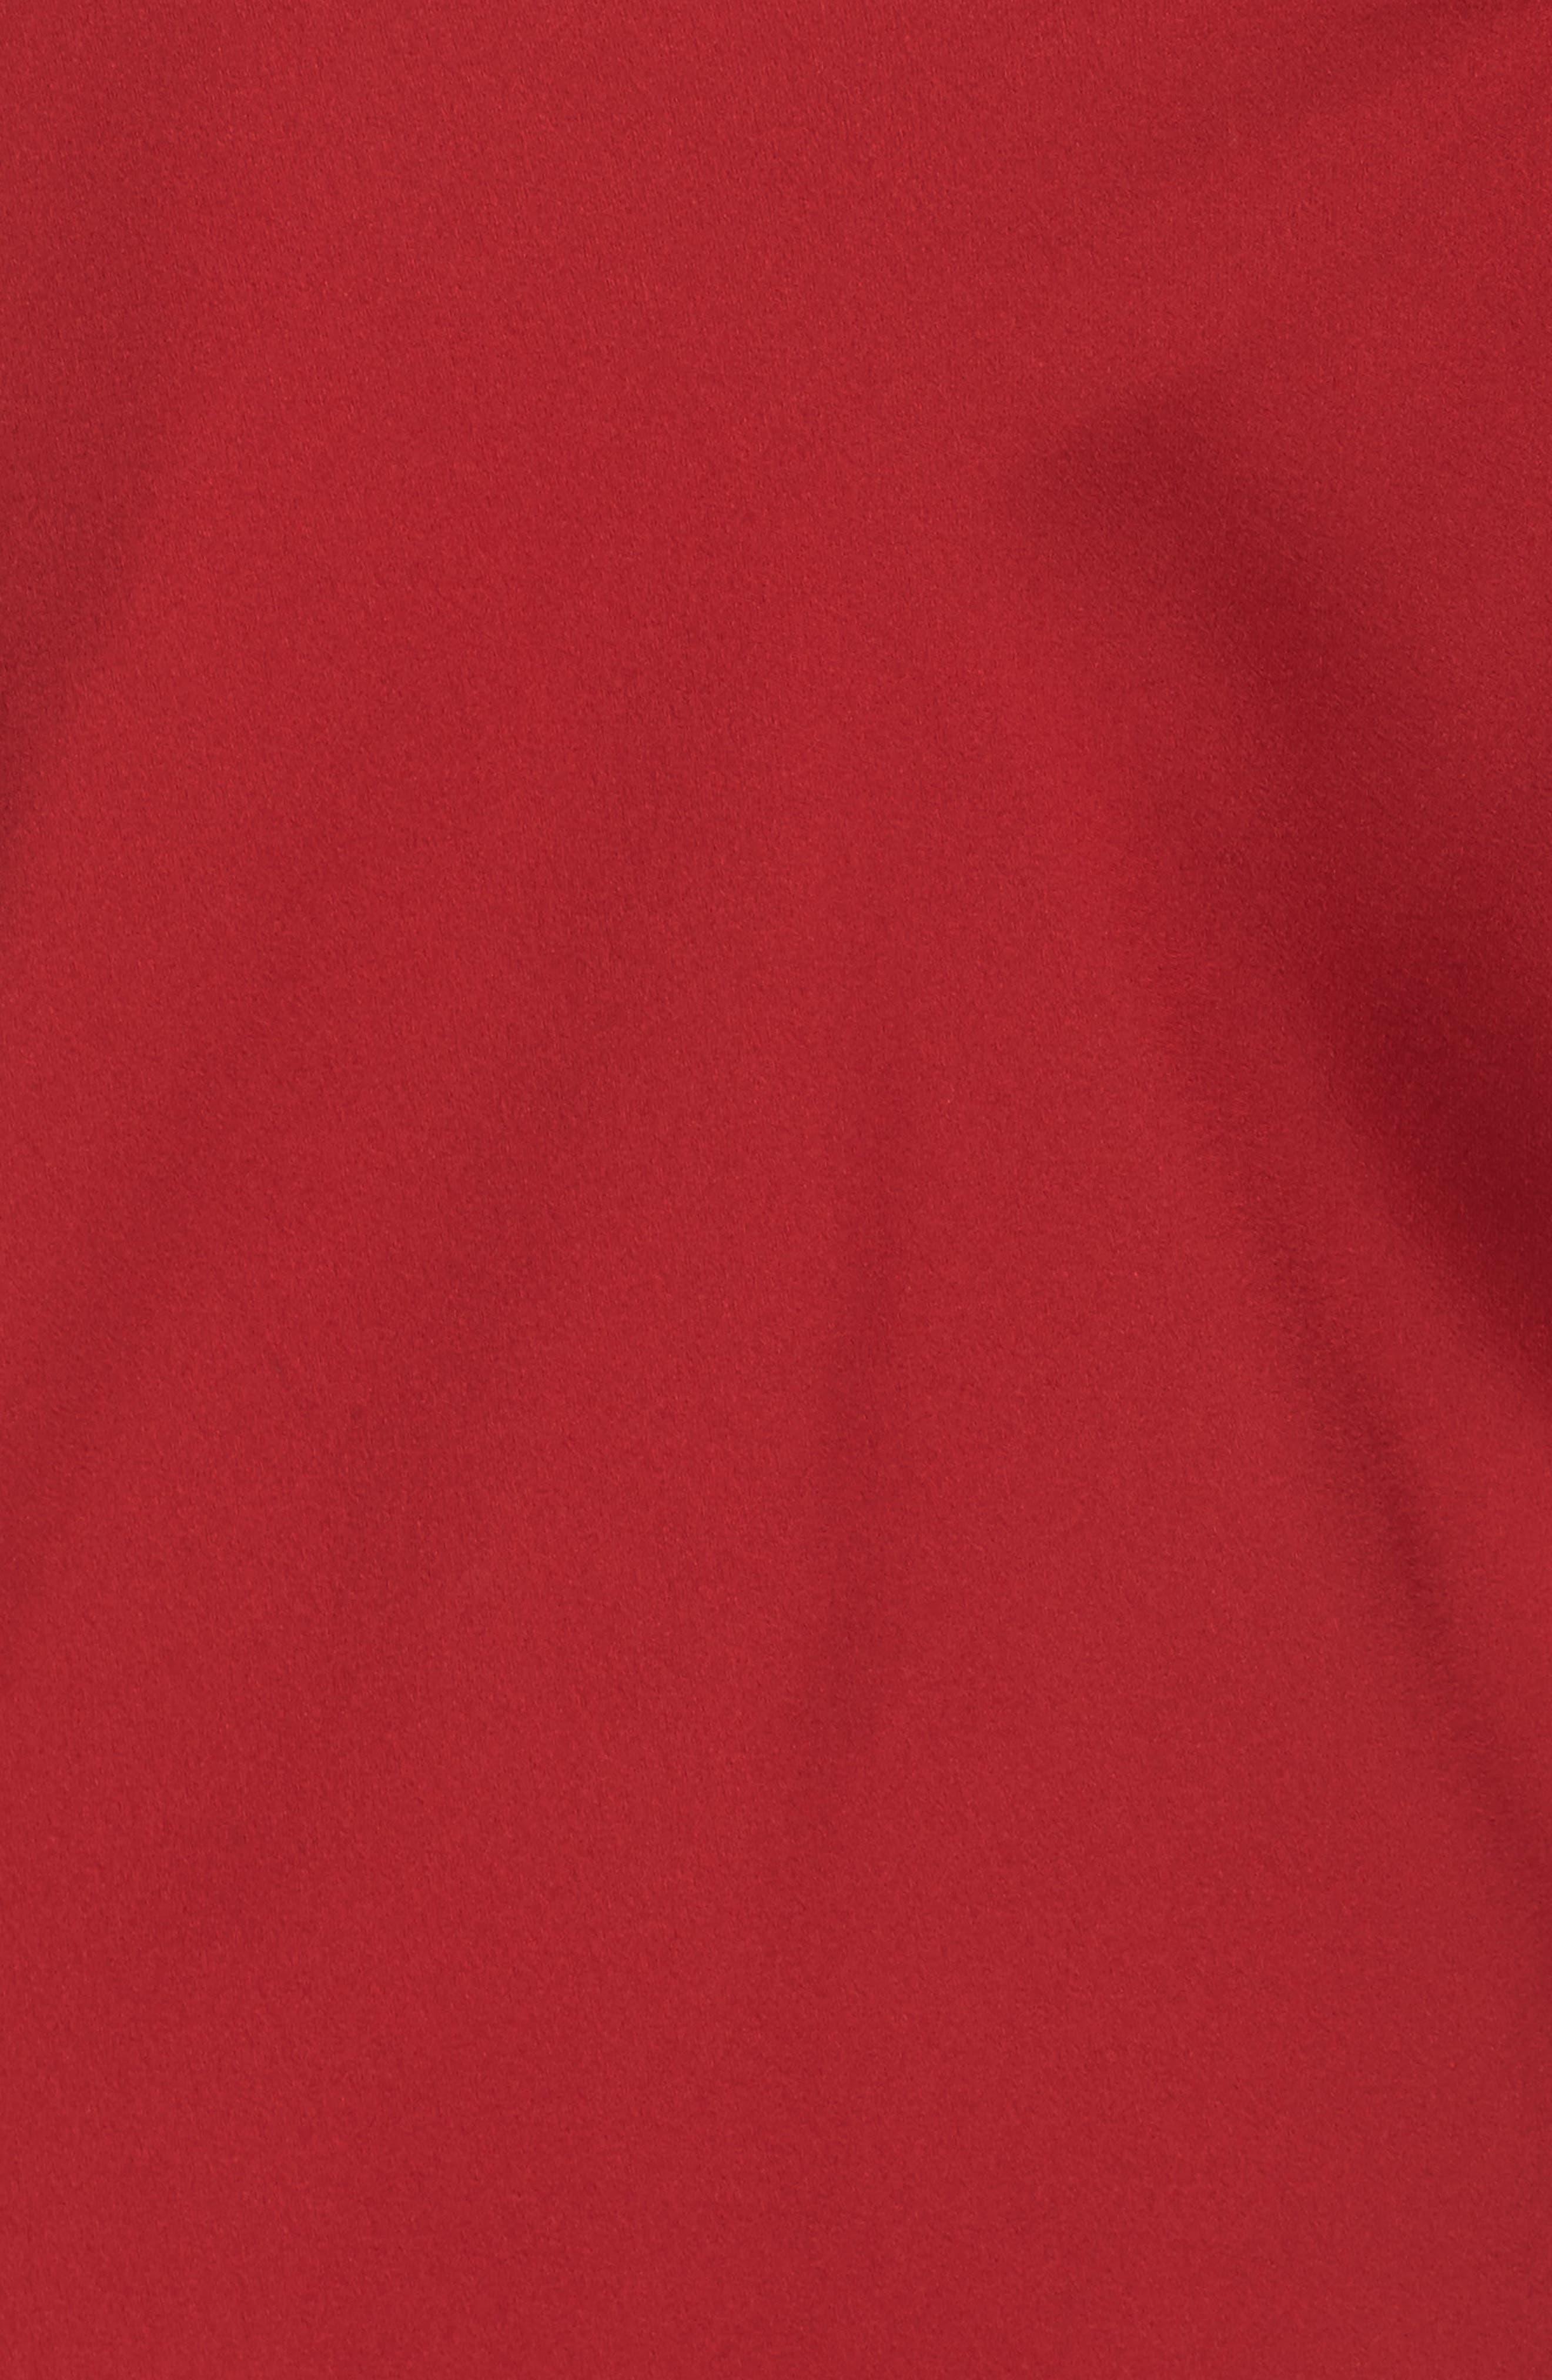 Feathers Satin Chemise,                             Alternate thumbnail 5, color,                             Crimson Red